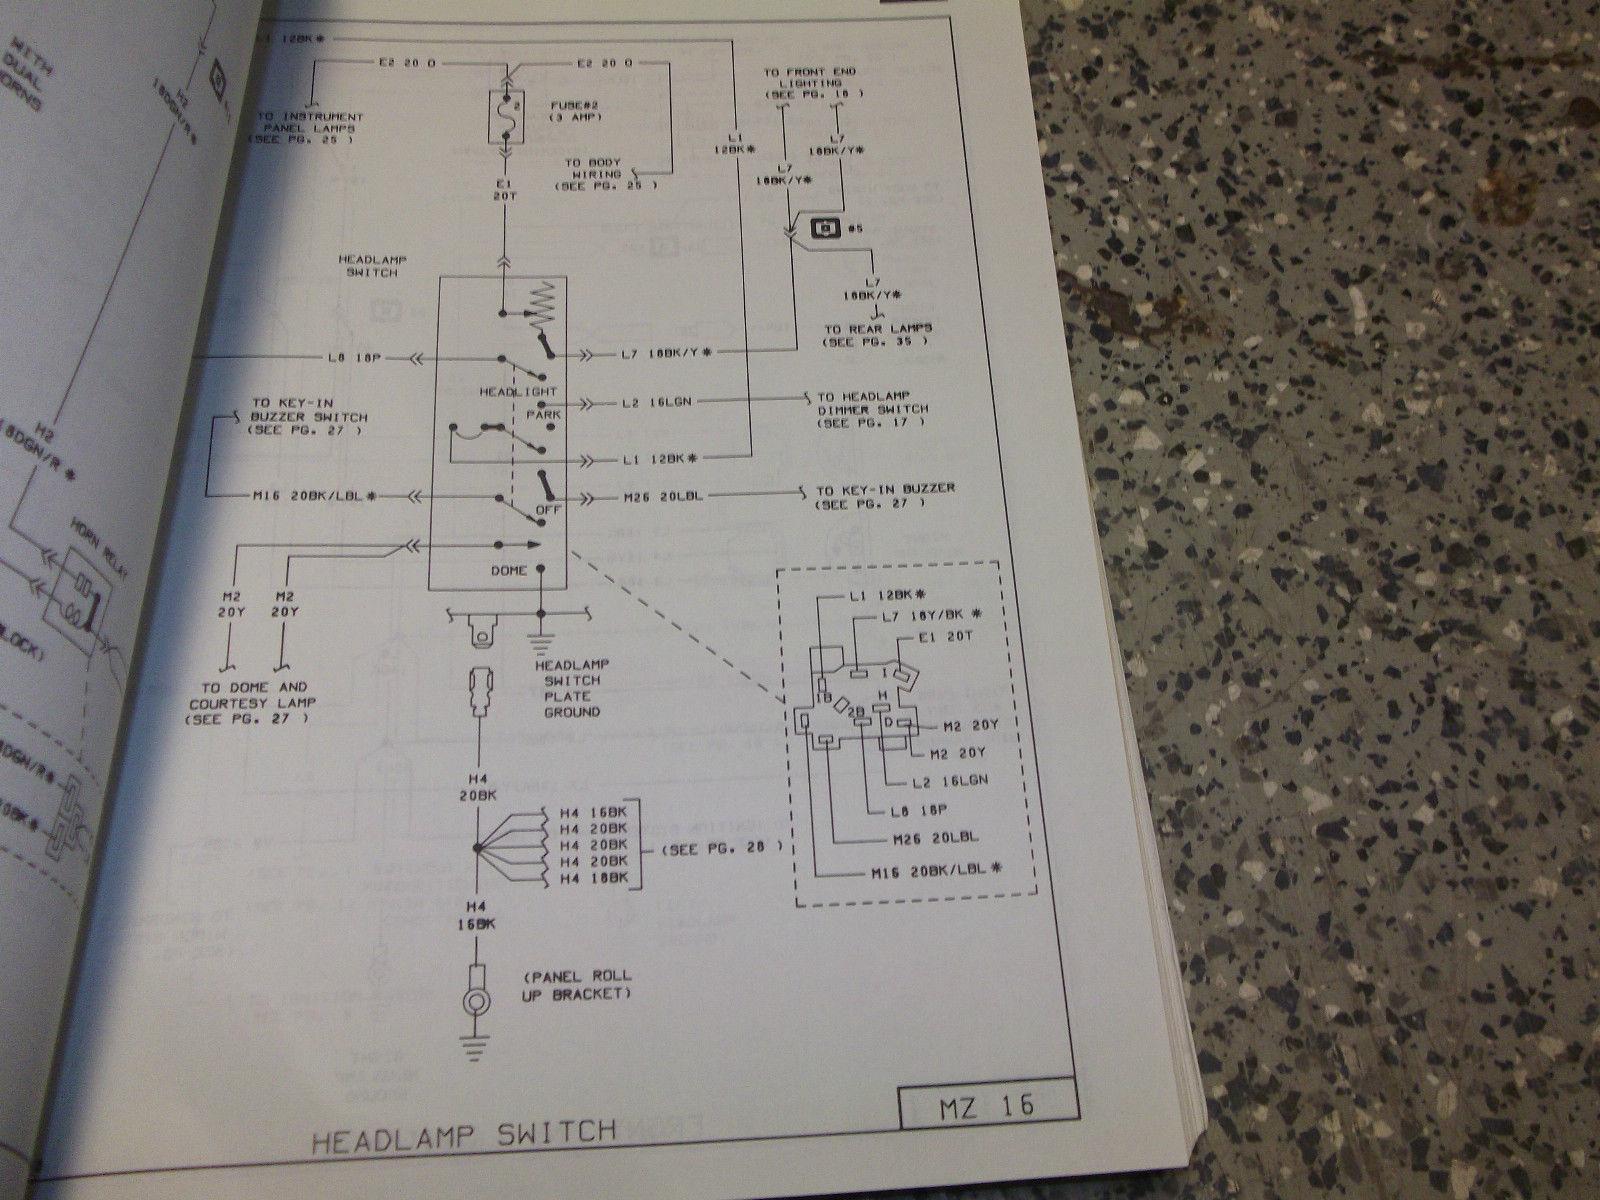 1978 DODGE OMNI PLYMOUTH HORIZON Service Shop Repair Manual ADVANCED EDITION image 5